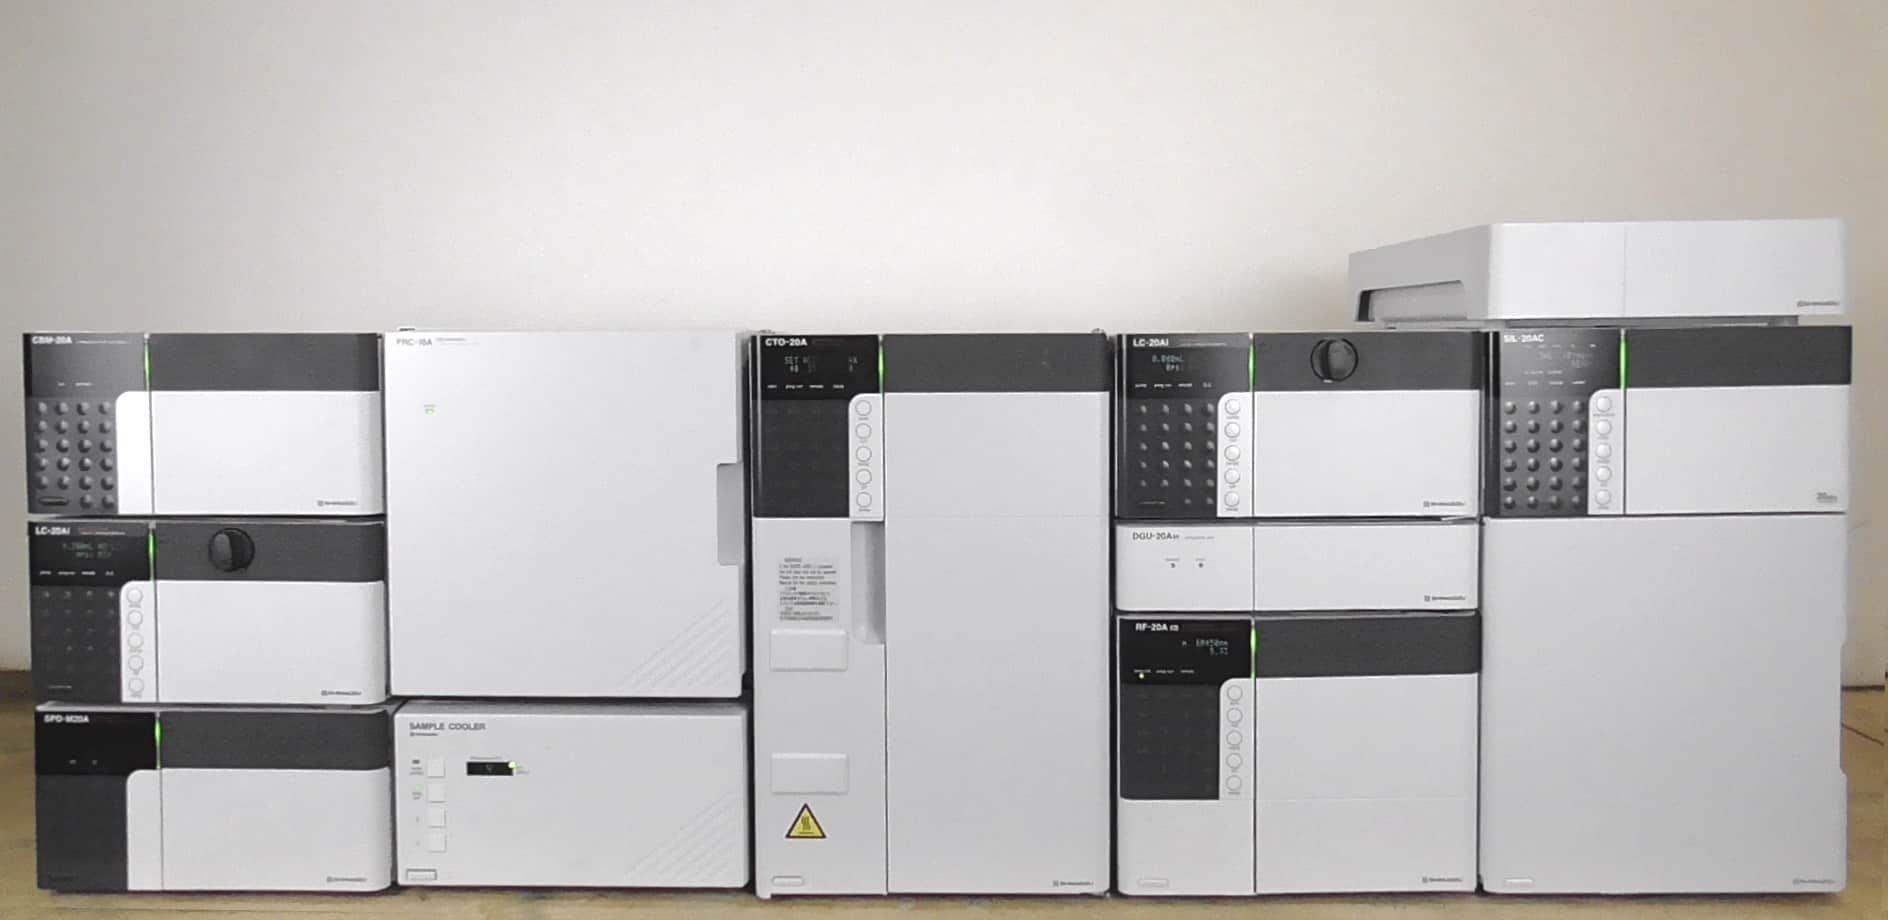 Shimadzu Prominence UFLC (Ultra Fast Liquid Chromatograph) System